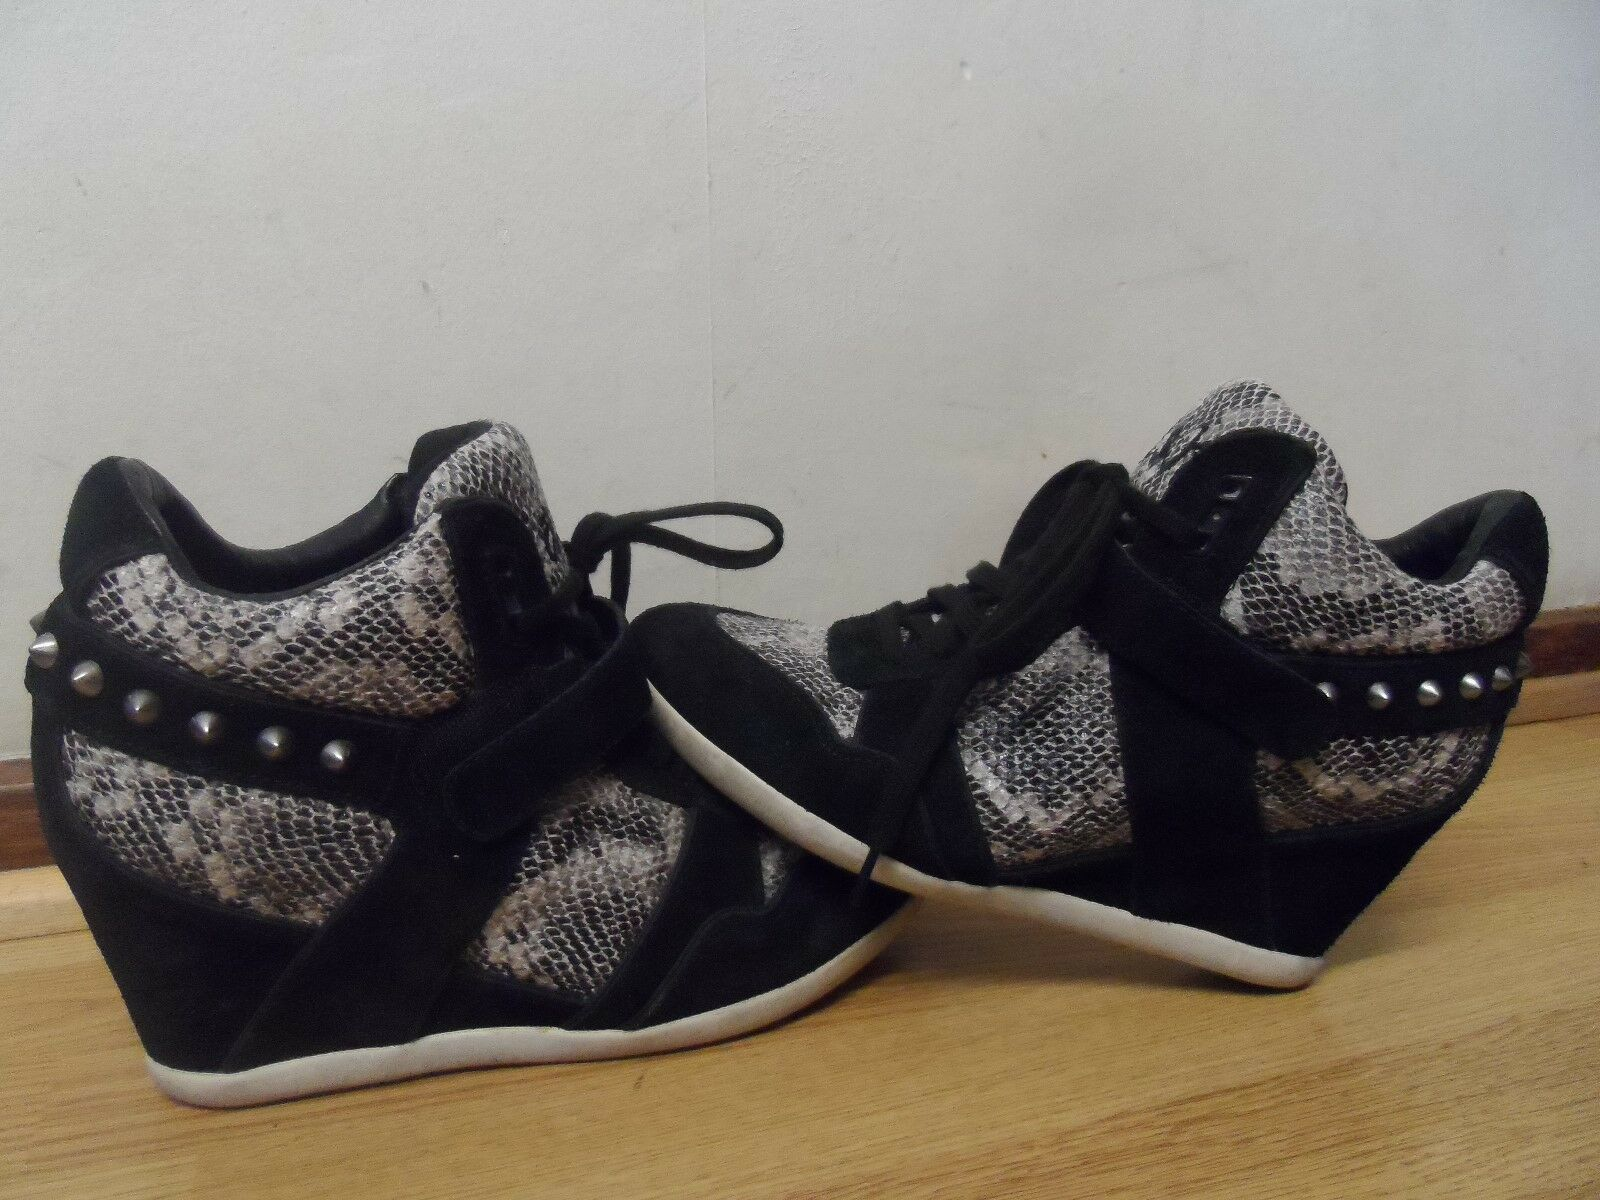 Ash Chaussures Femme Talons Hauts Chaussures Taille UK 7 EU 41